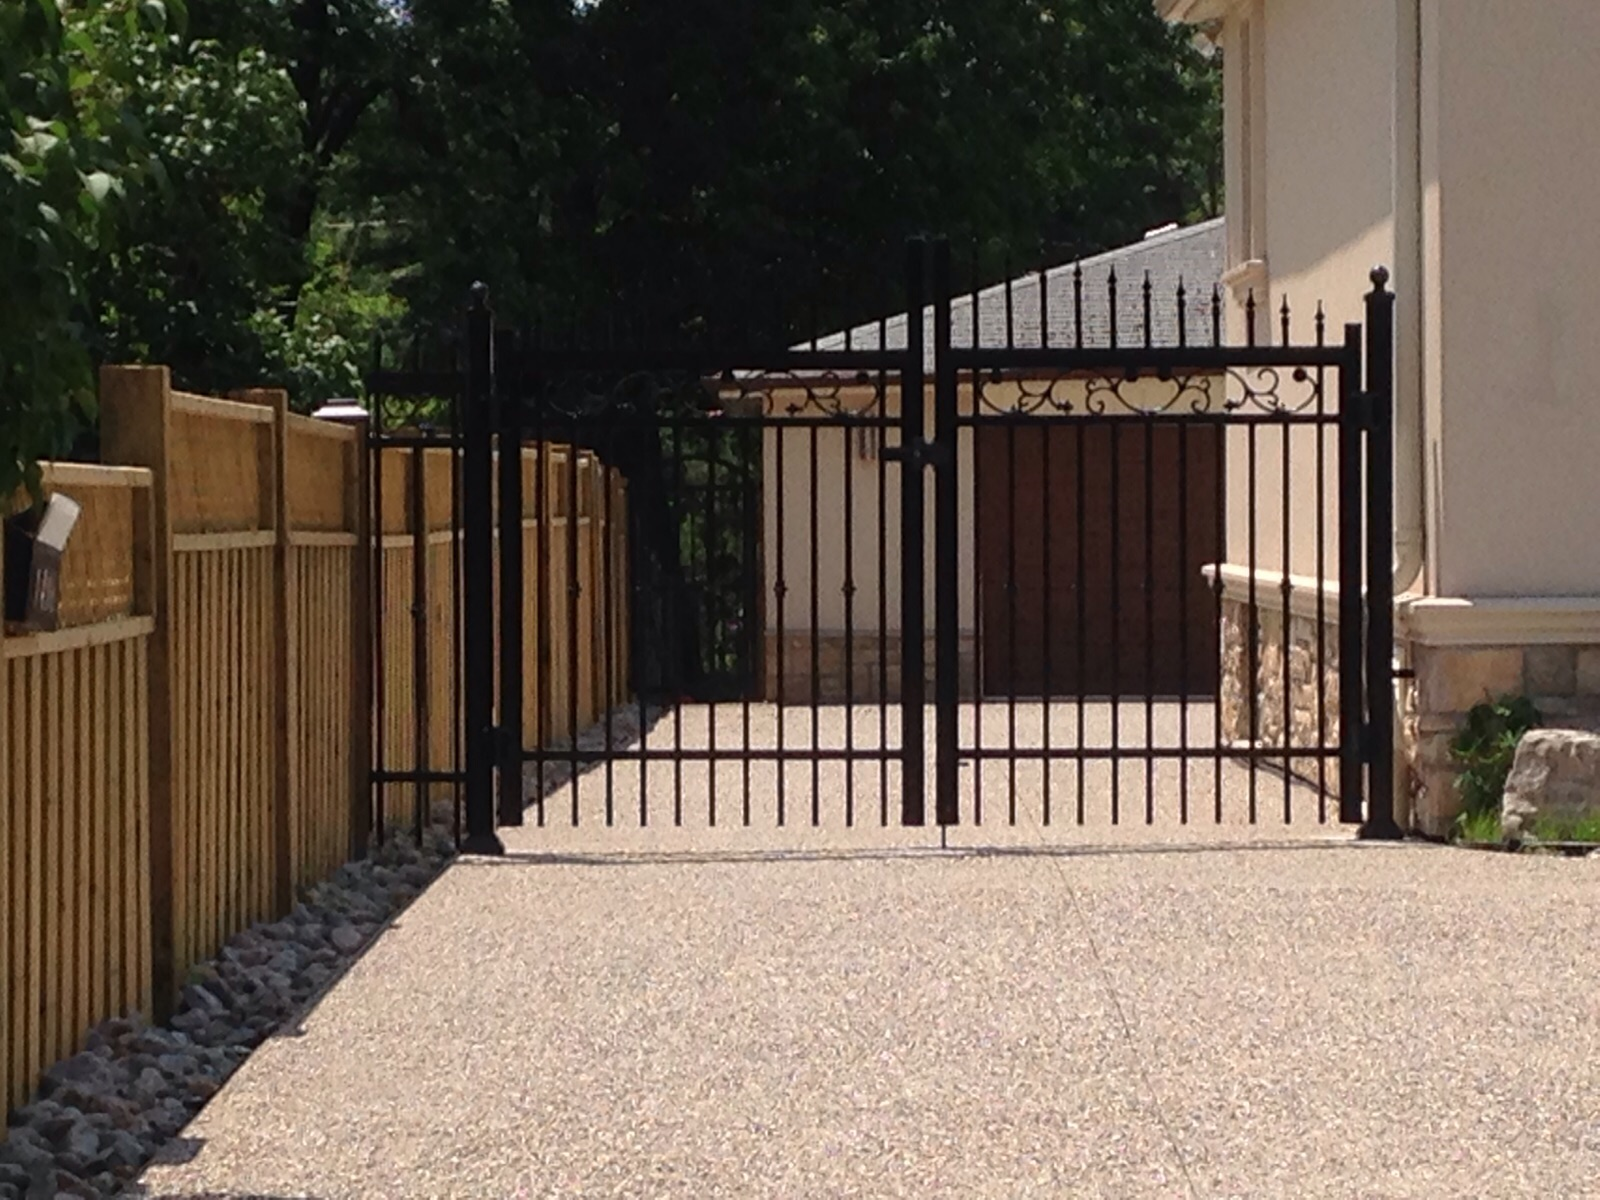 Pickety driveway gate